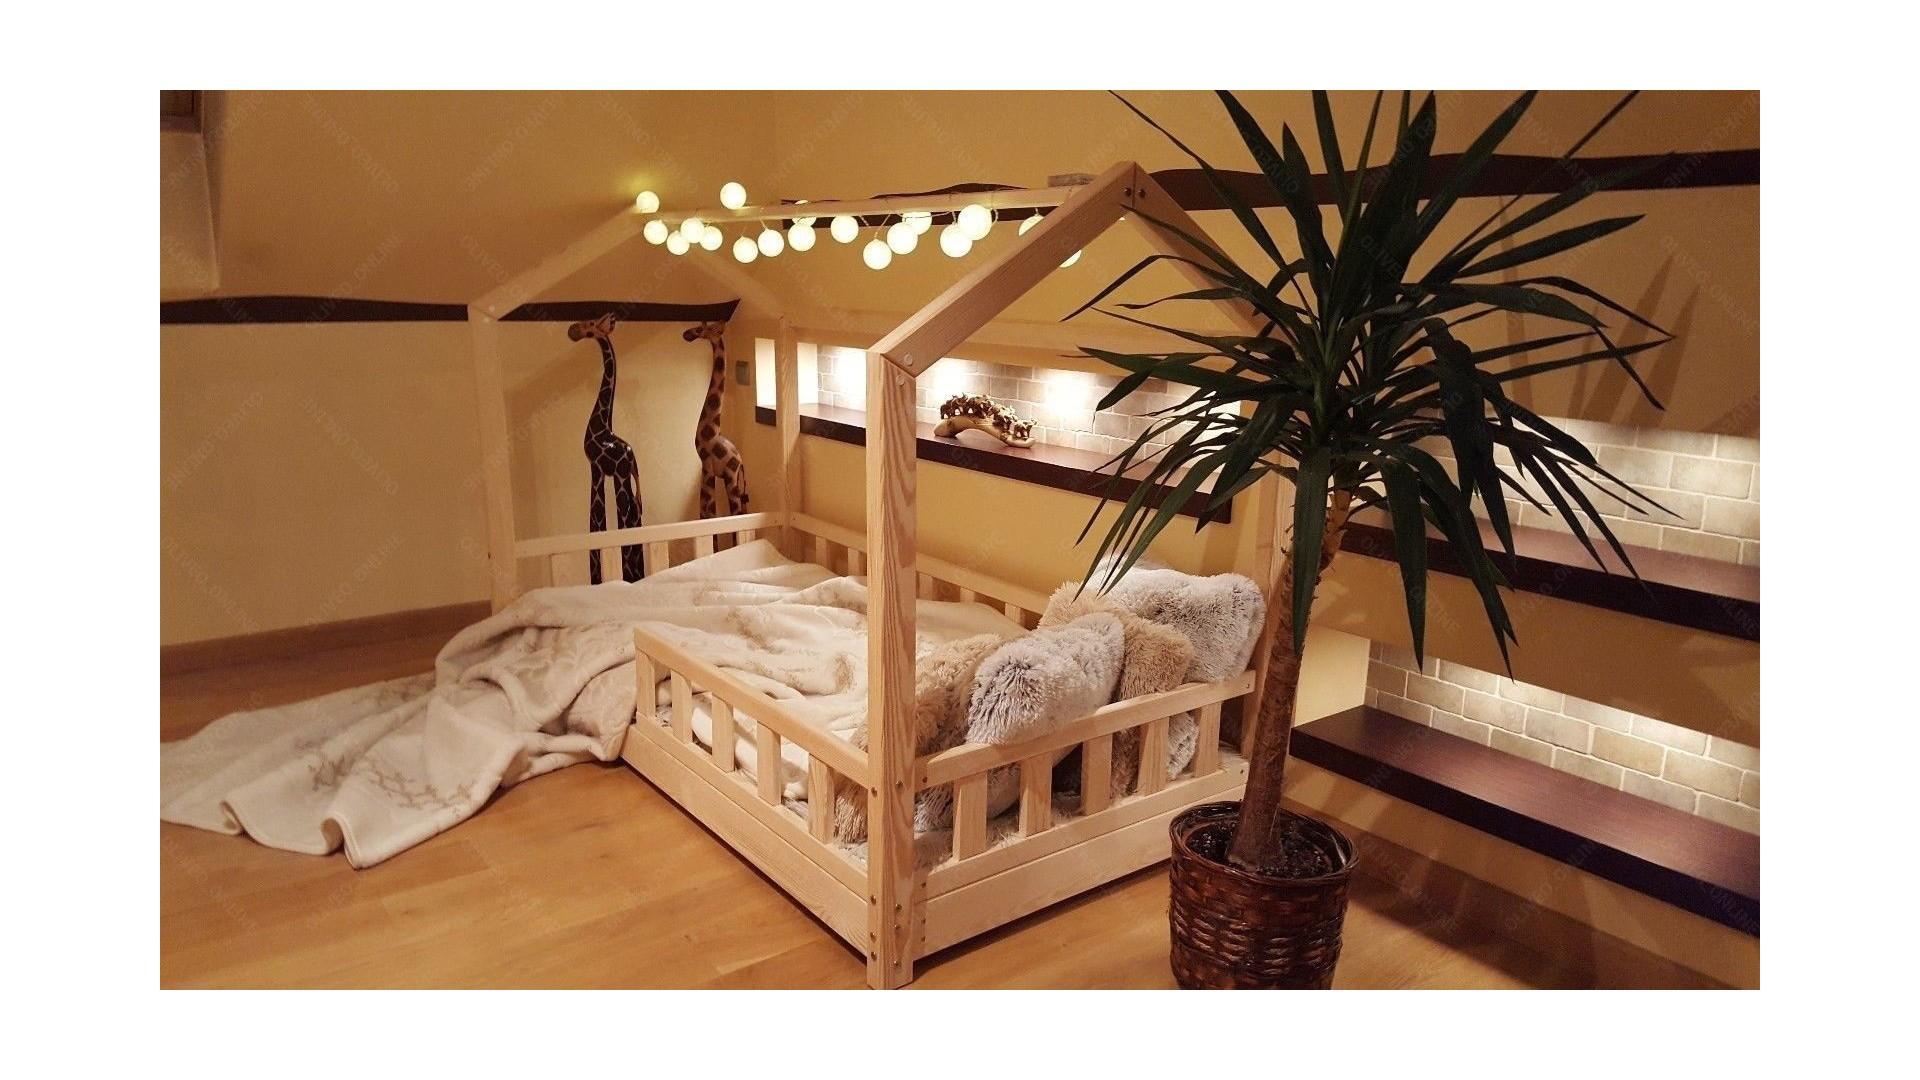 house bed bella with barrier 60 x 120cm house bed. Black Bedroom Furniture Sets. Home Design Ideas